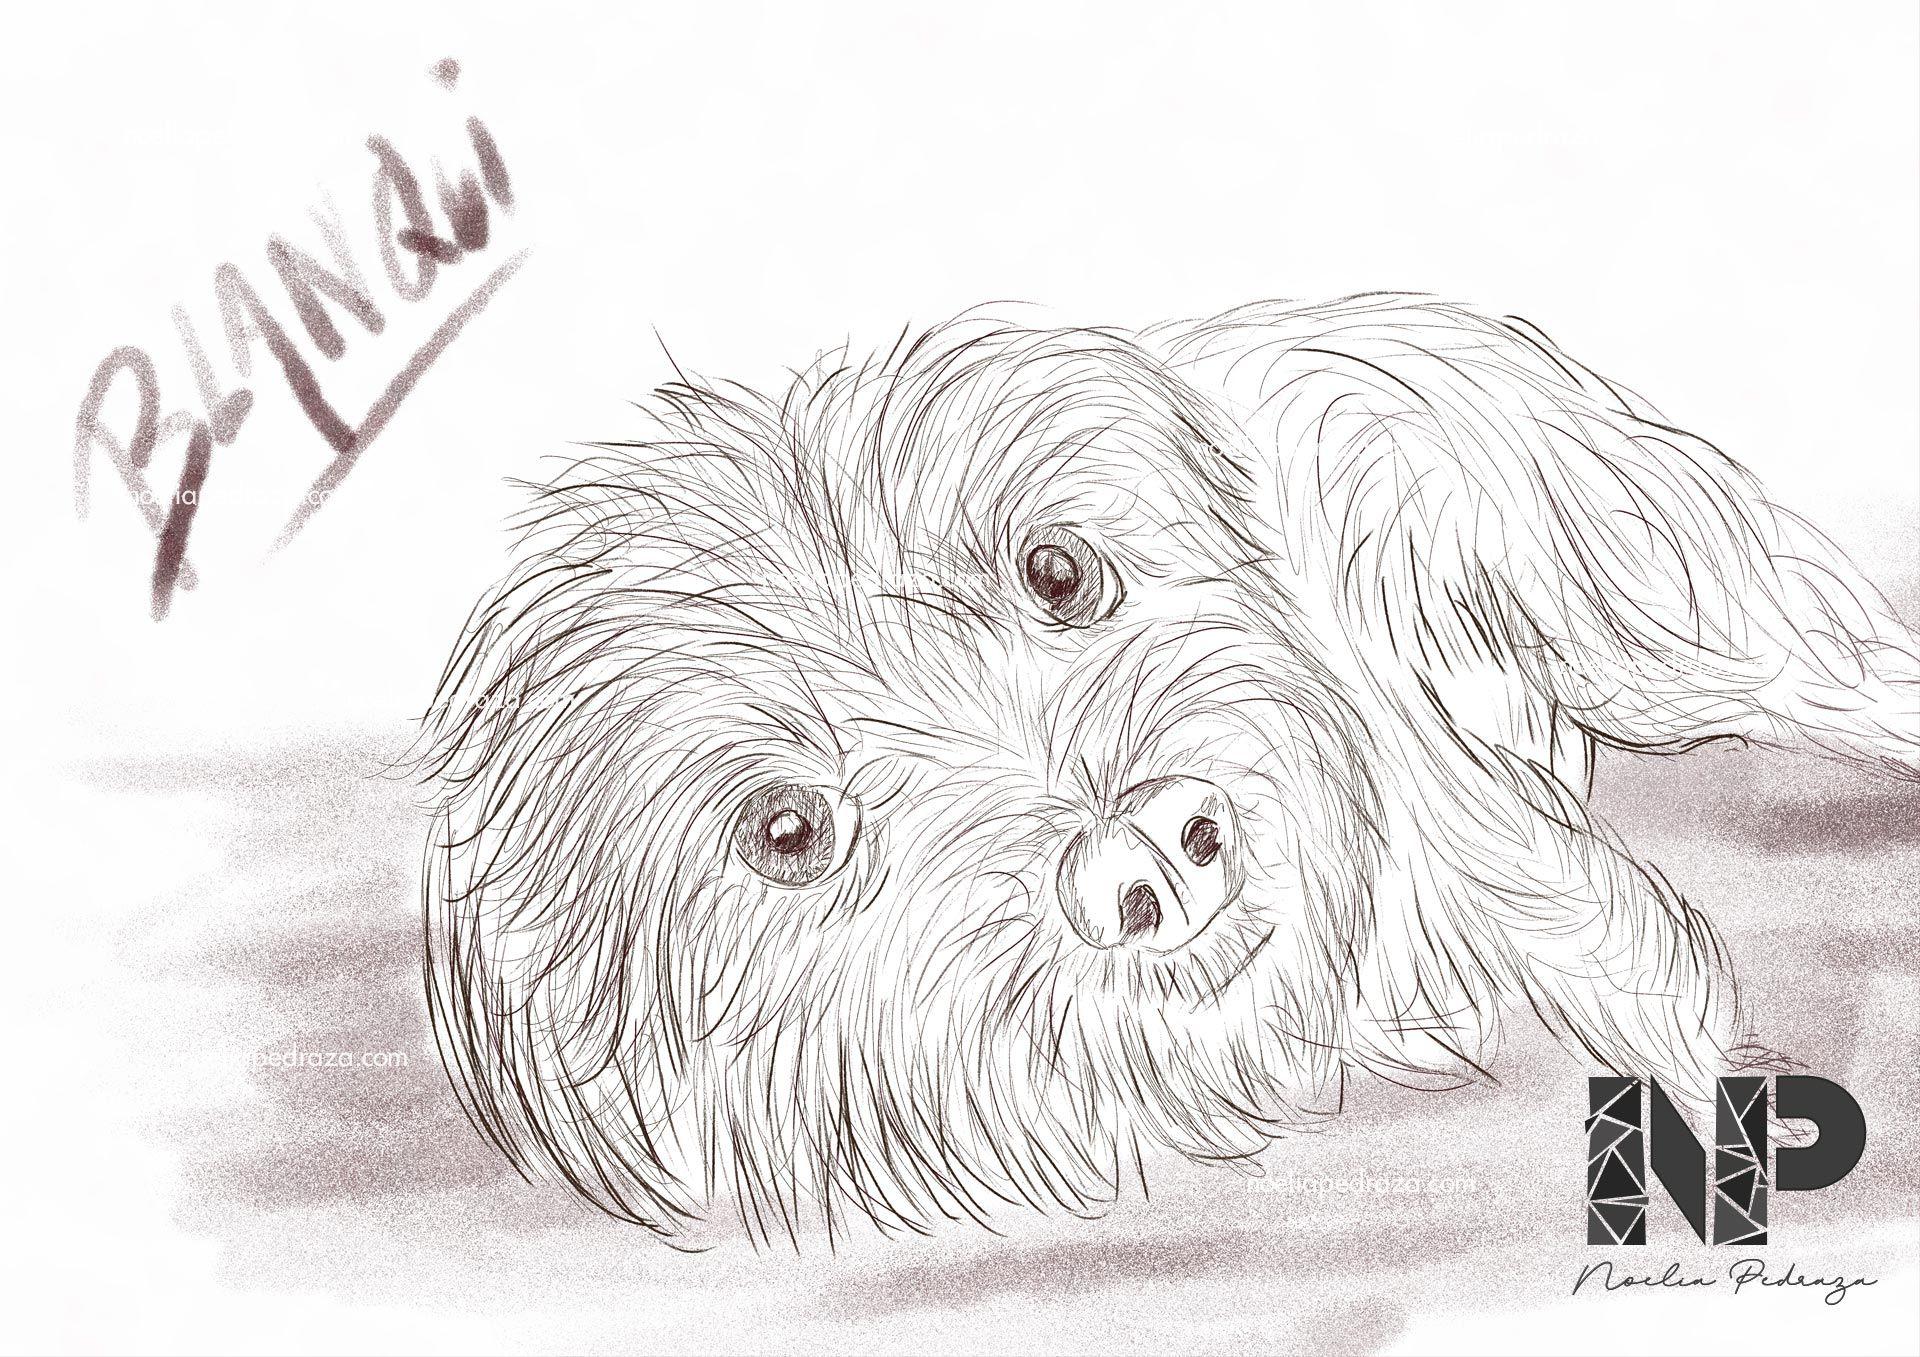 Dibujo o ilustración de perrito Blanqui Photoshop Illustrator